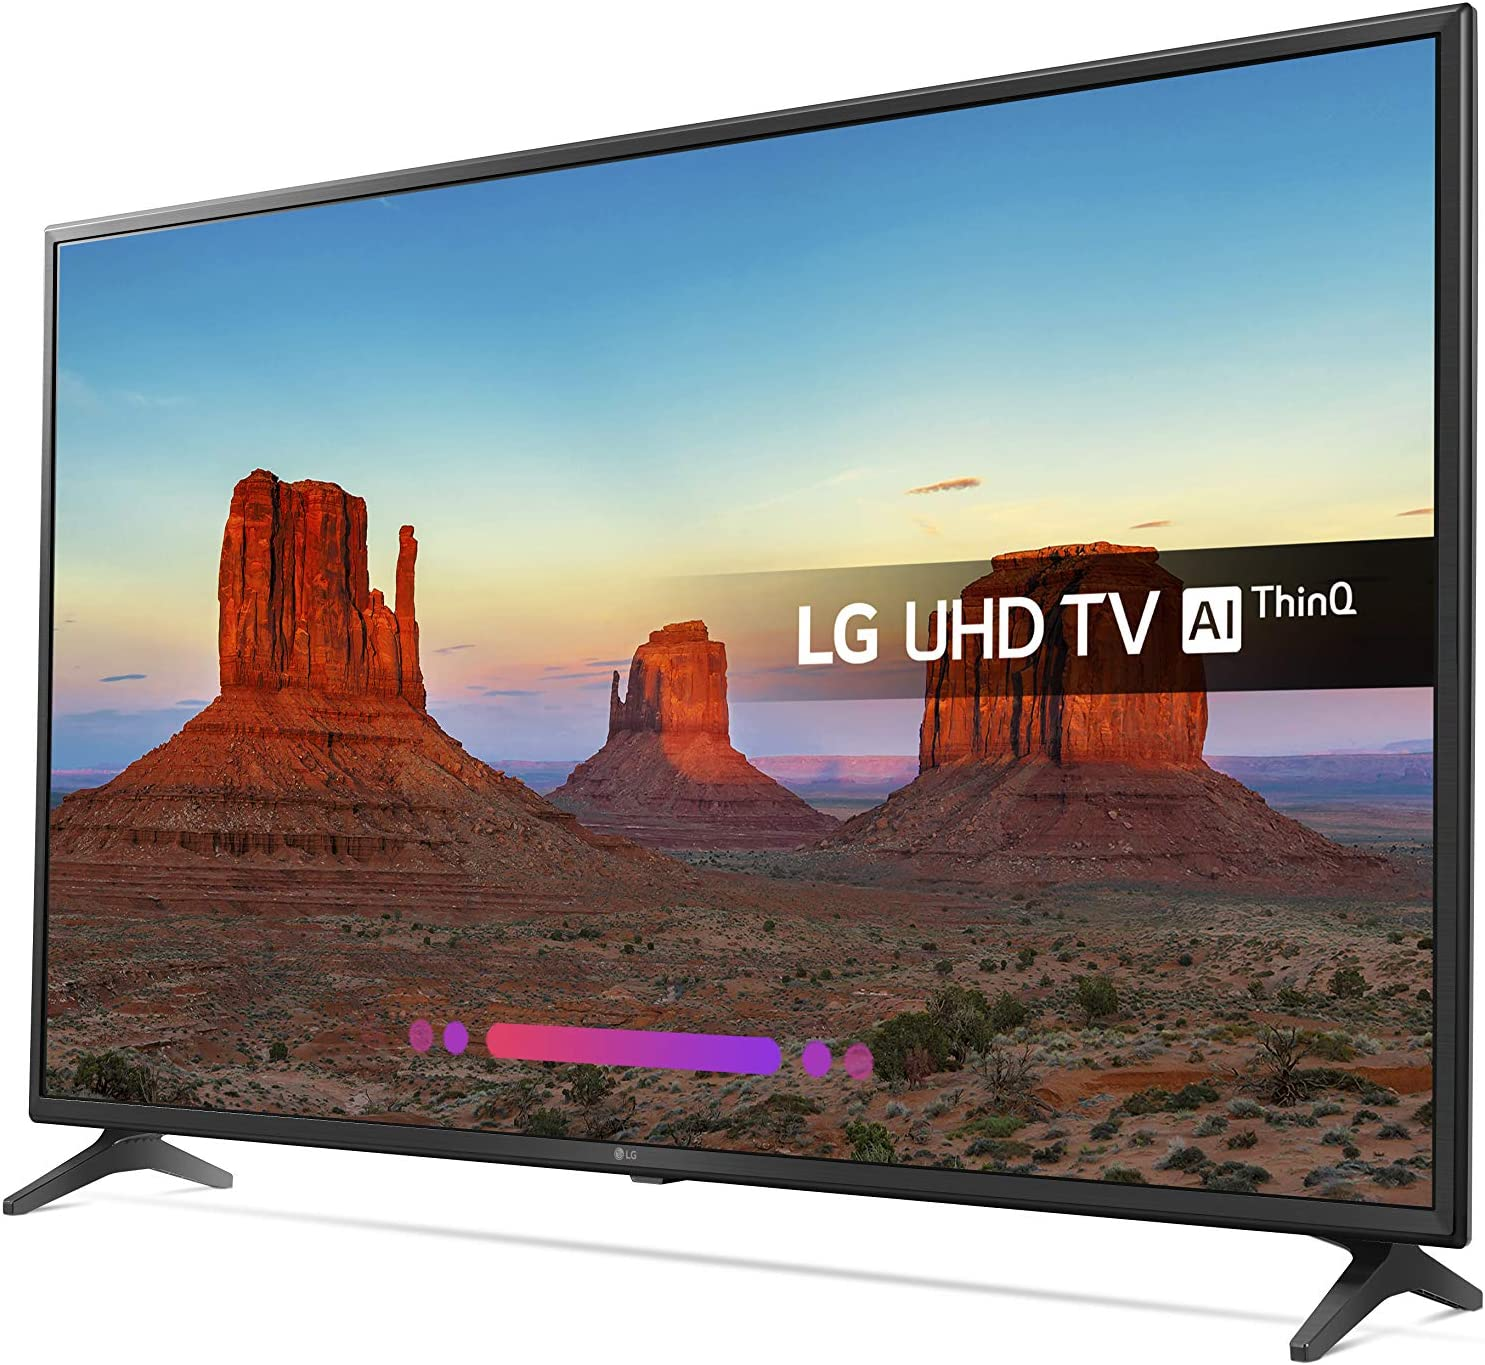 Tv Lg Led 55uk6200pla 55inch 139,70 Cms Uhd 4k Smart Tv Wifi ...